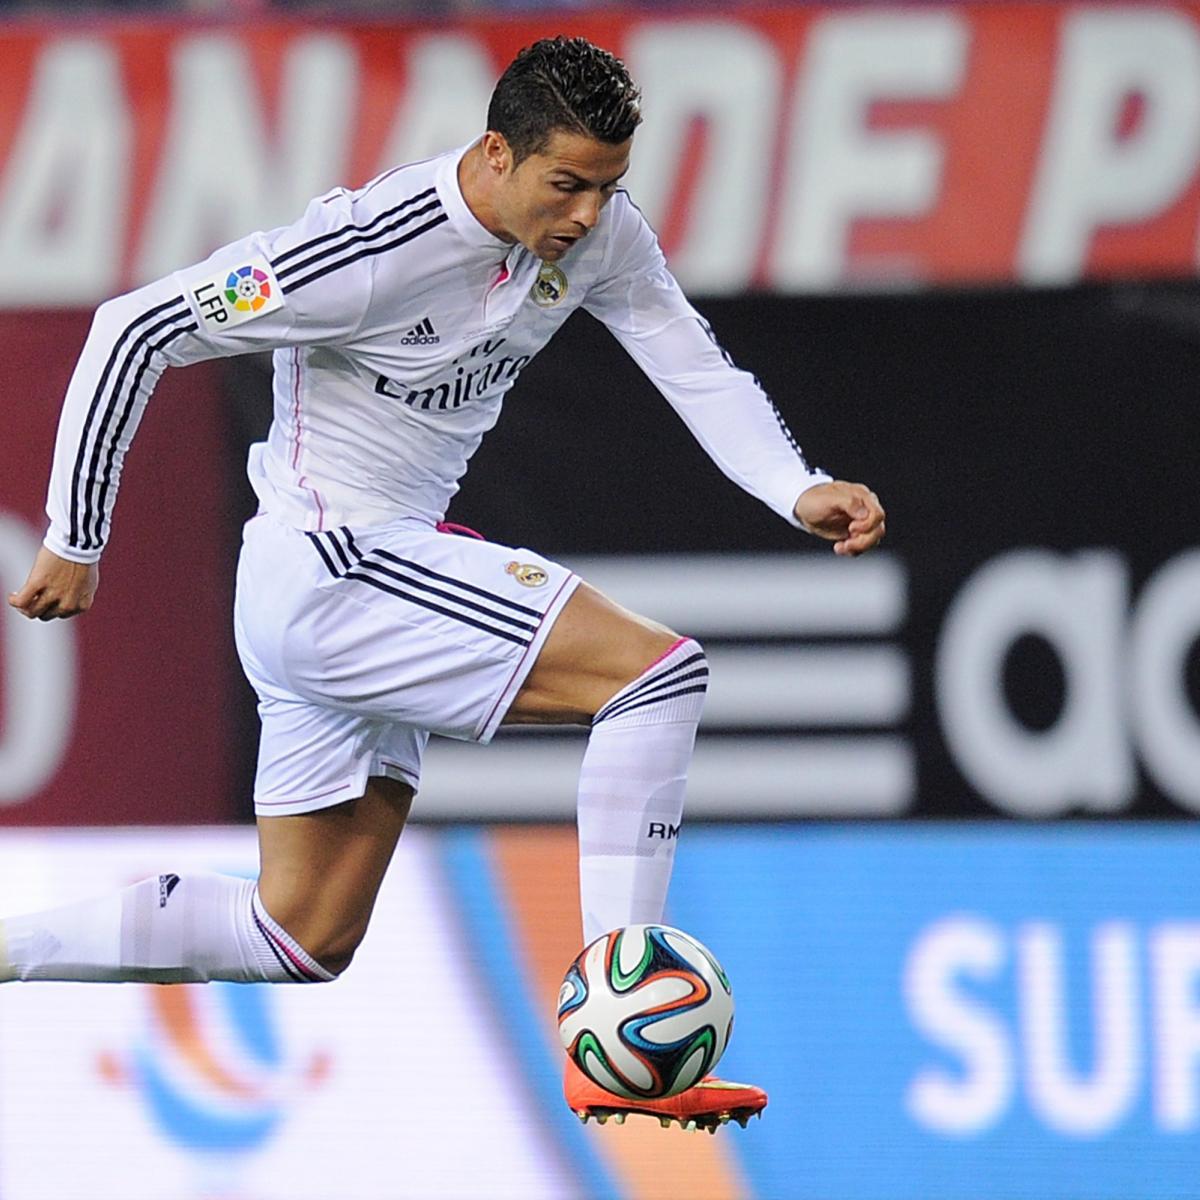 Manchester United Transfer News Lucas Moura And Cristiano: Manchester United Transfer News: Cristiano Ronaldo Offer